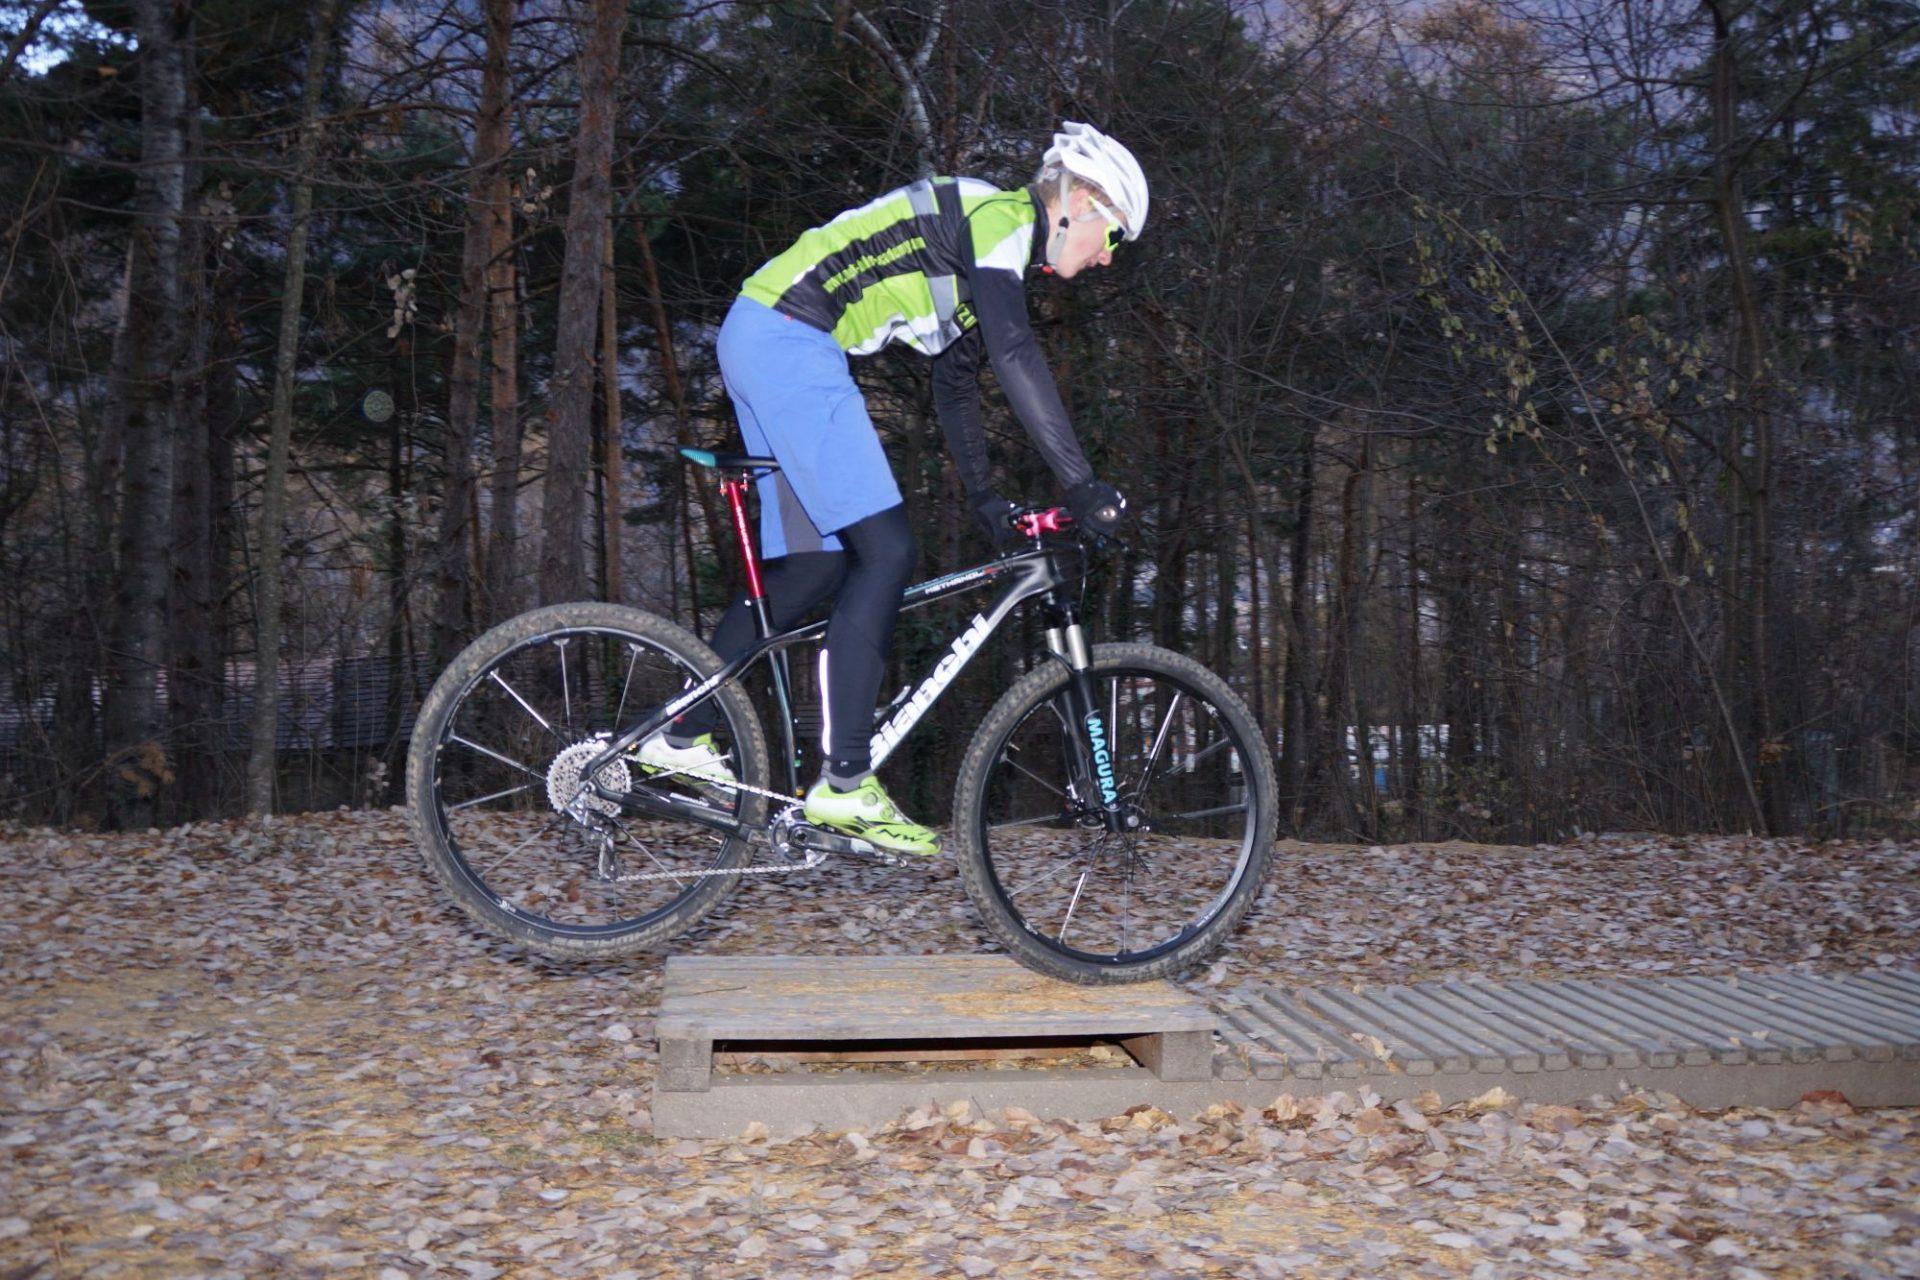 Bergsteigertipp MTB Hindernis 04 I (c) OetziBikeAcqademy